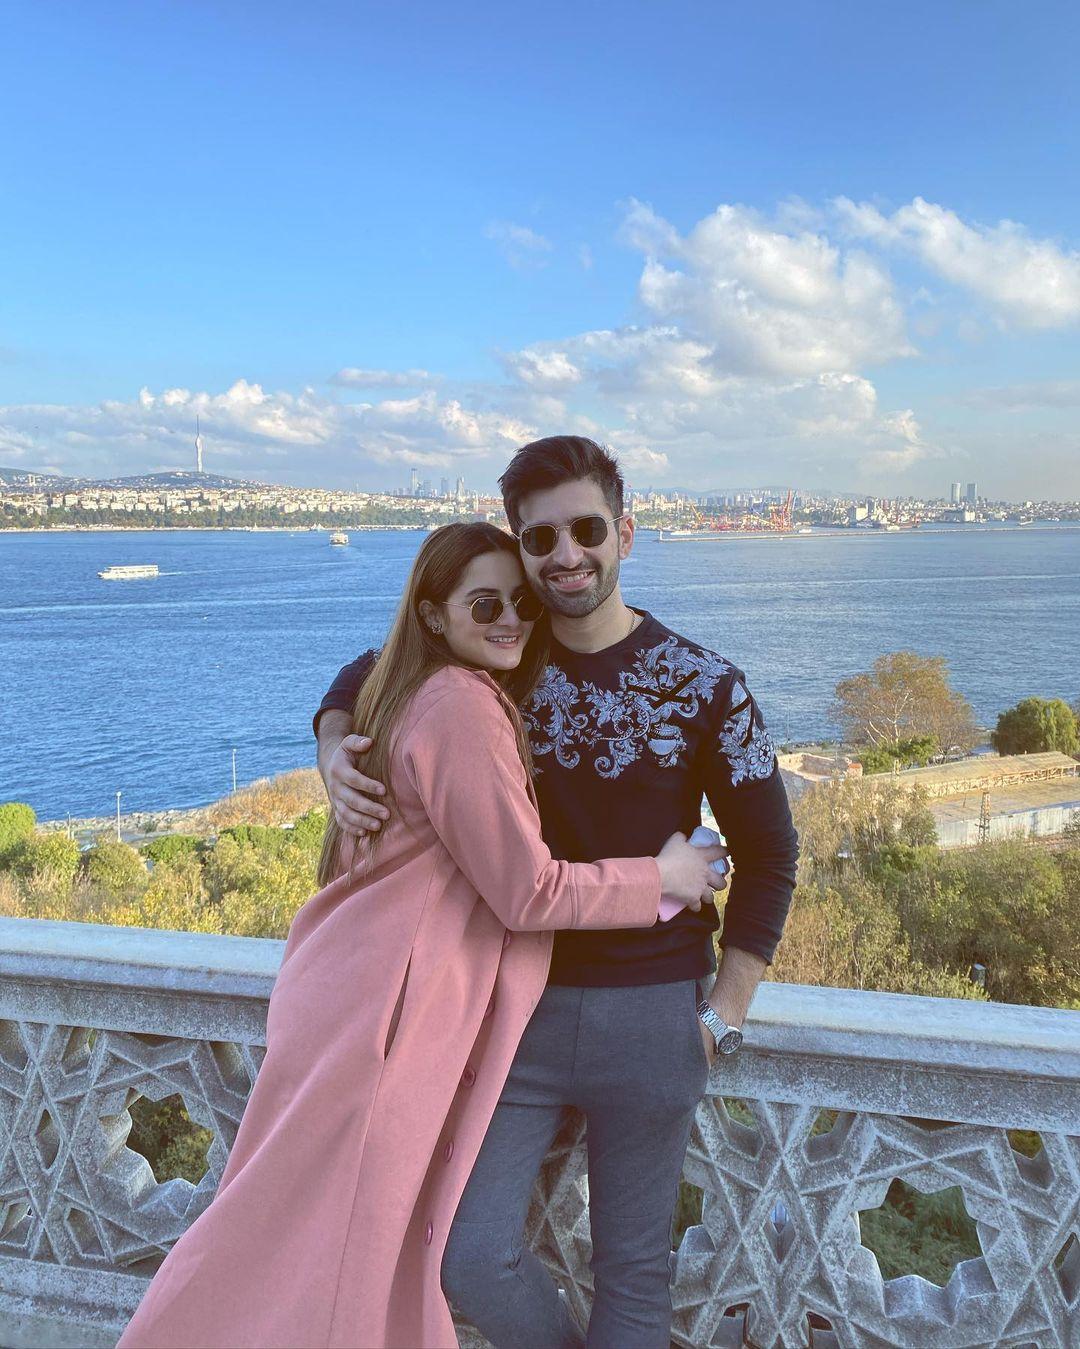 Aiman Khan and Muneeb Butt Enjoying Holidays in Turkey - Day 1